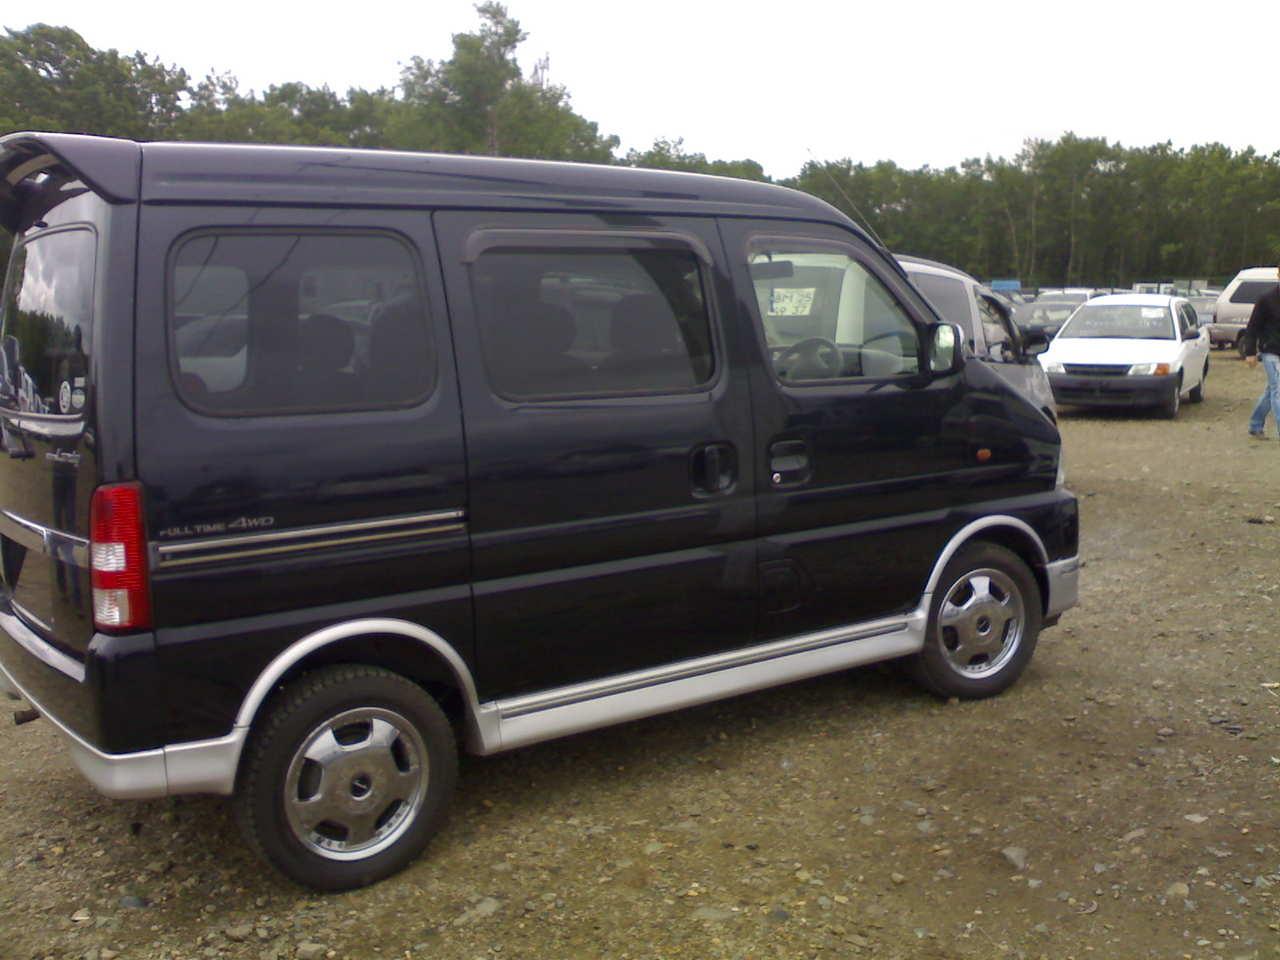 Used 2002 Suzuki Every Landy Photos, 1300cc., Gasoline, Automatic